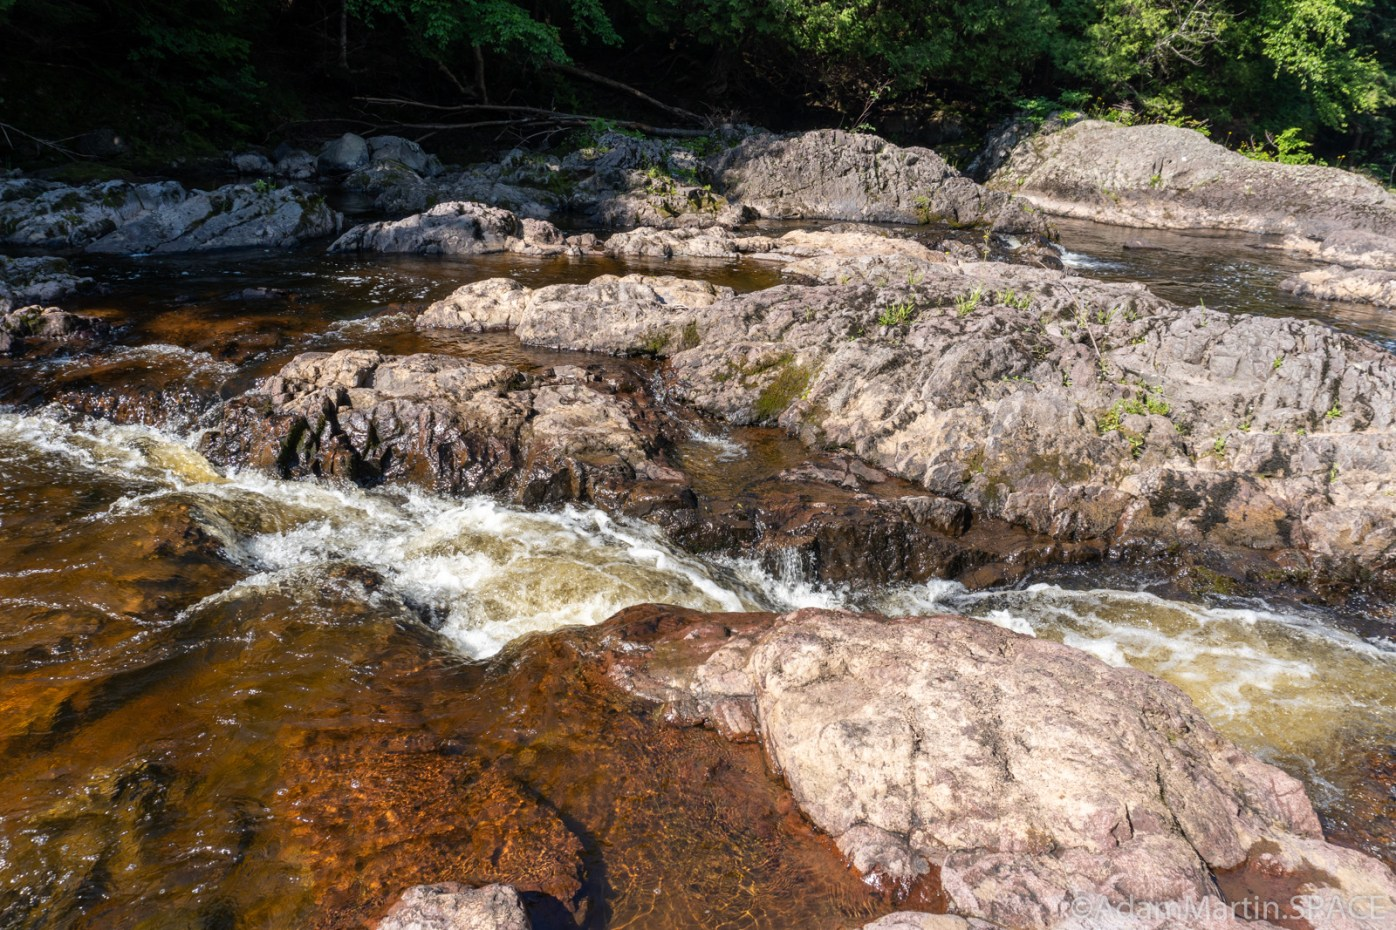 Potato River Dalles - Water cutting through rock